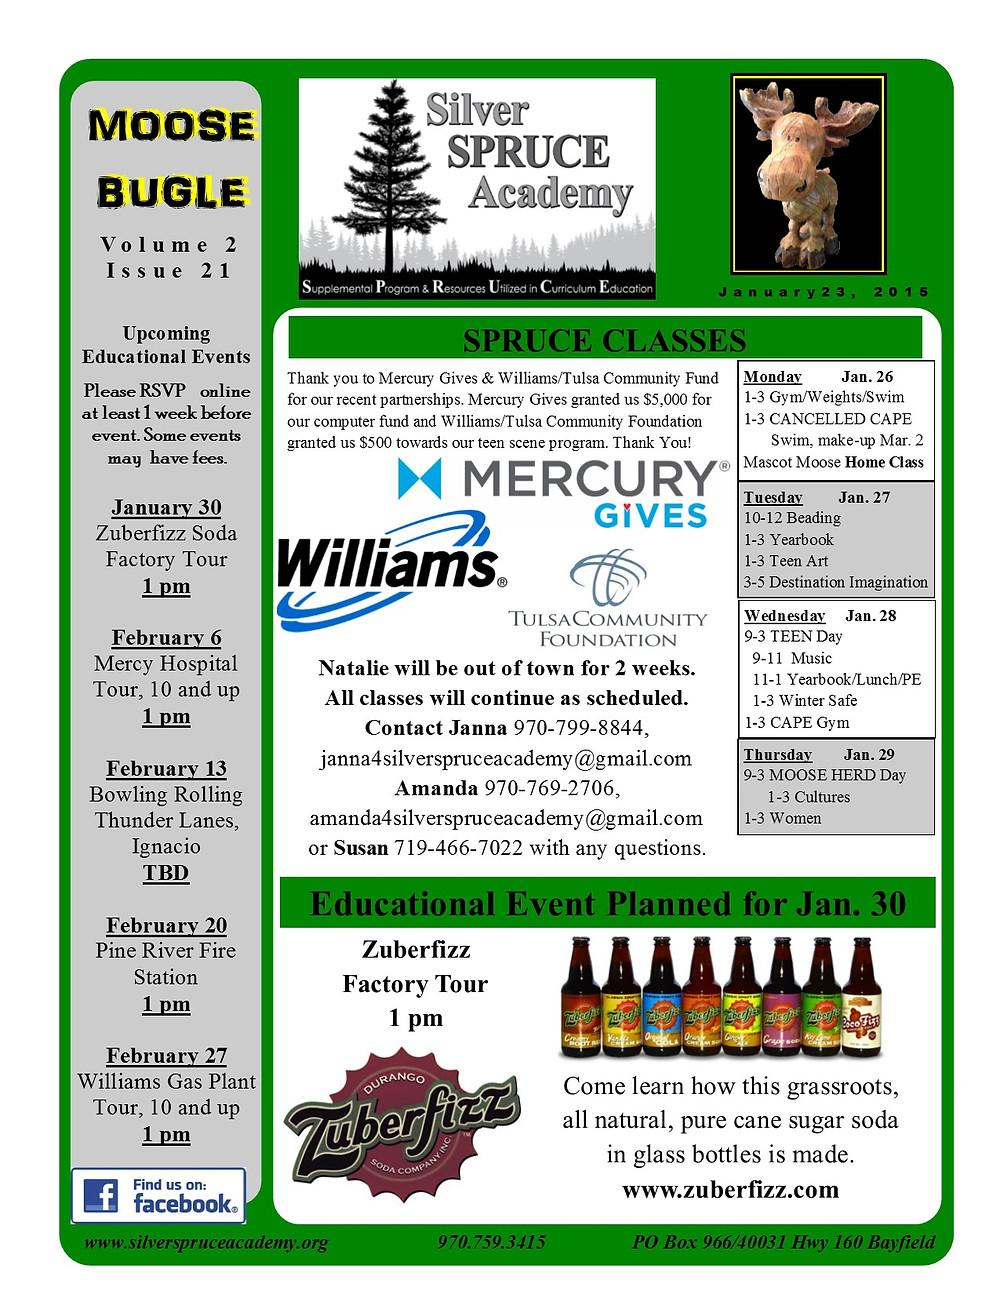 Moose Bugle 1-23-15 (Page 1) (1).jpg